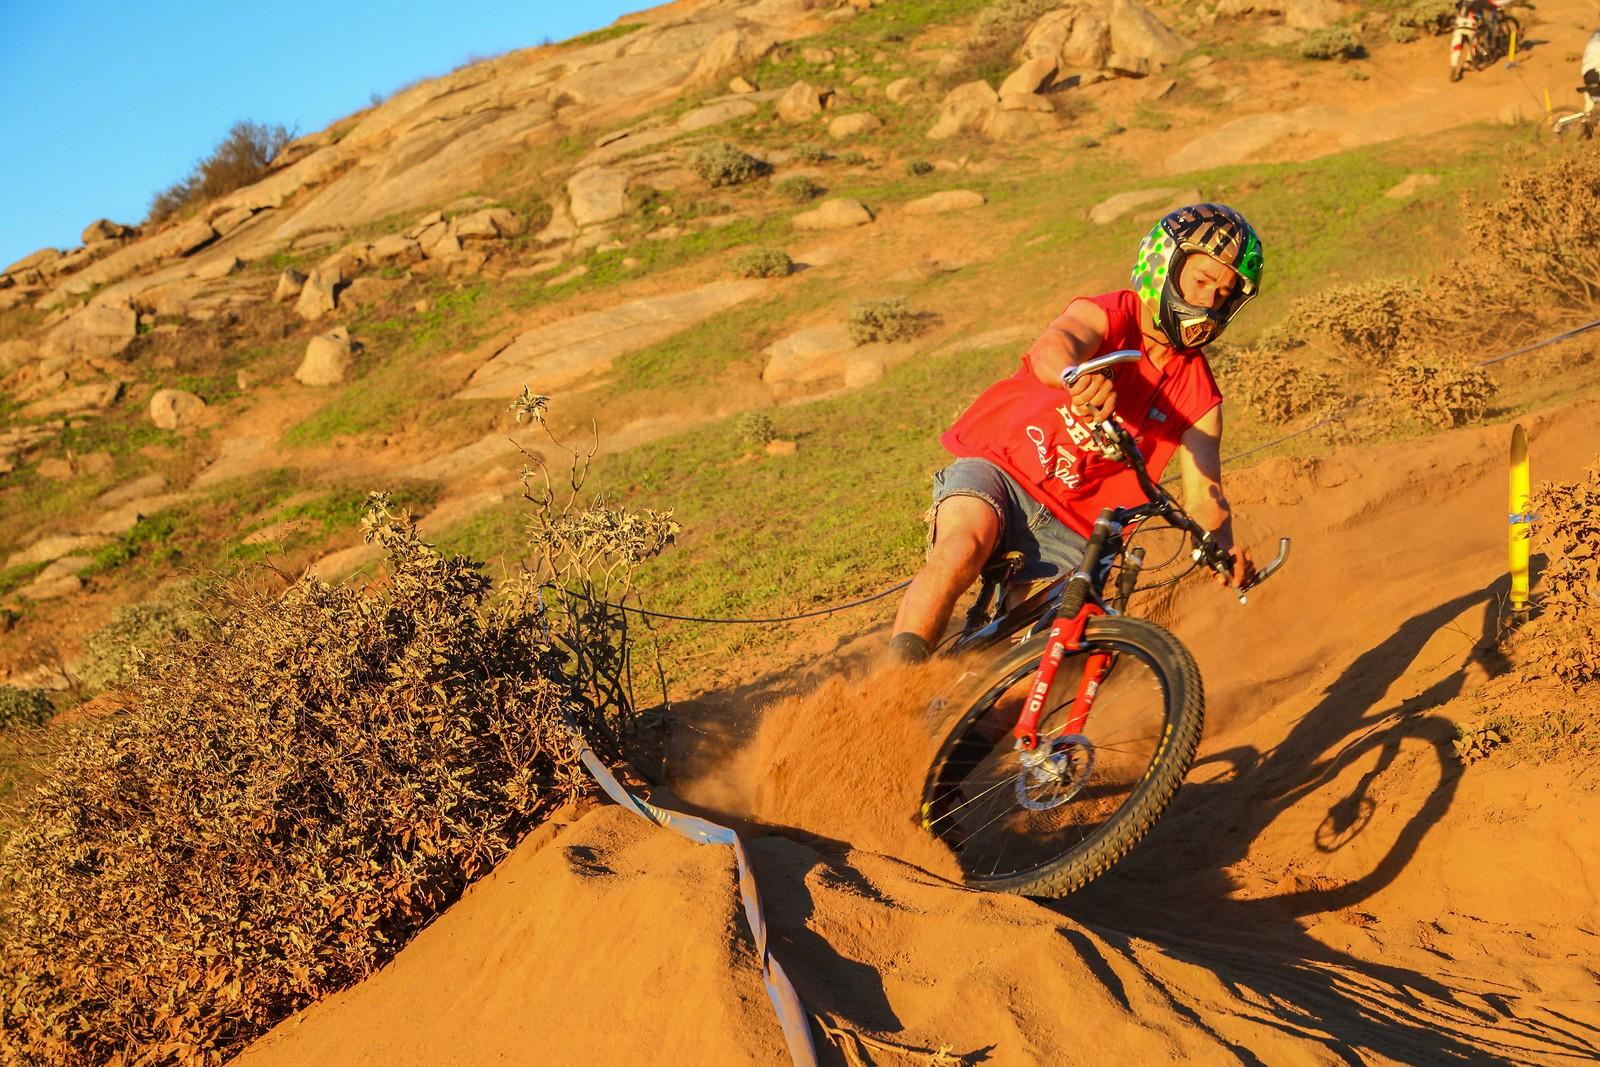 BOOM! - GnarHuck - Mountain Biking Pictures - Vital MTB